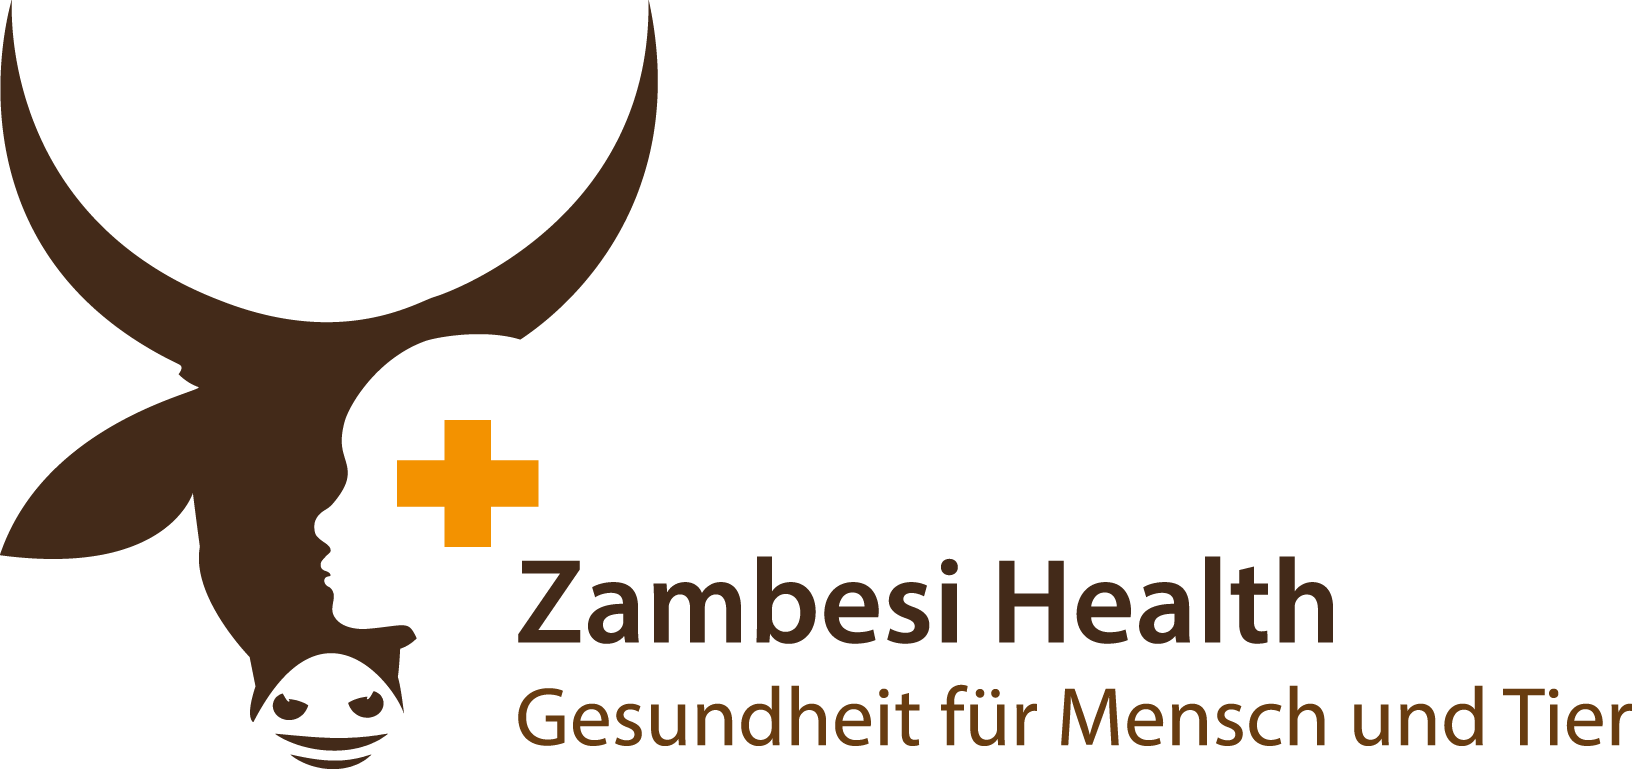 Zambesi Health